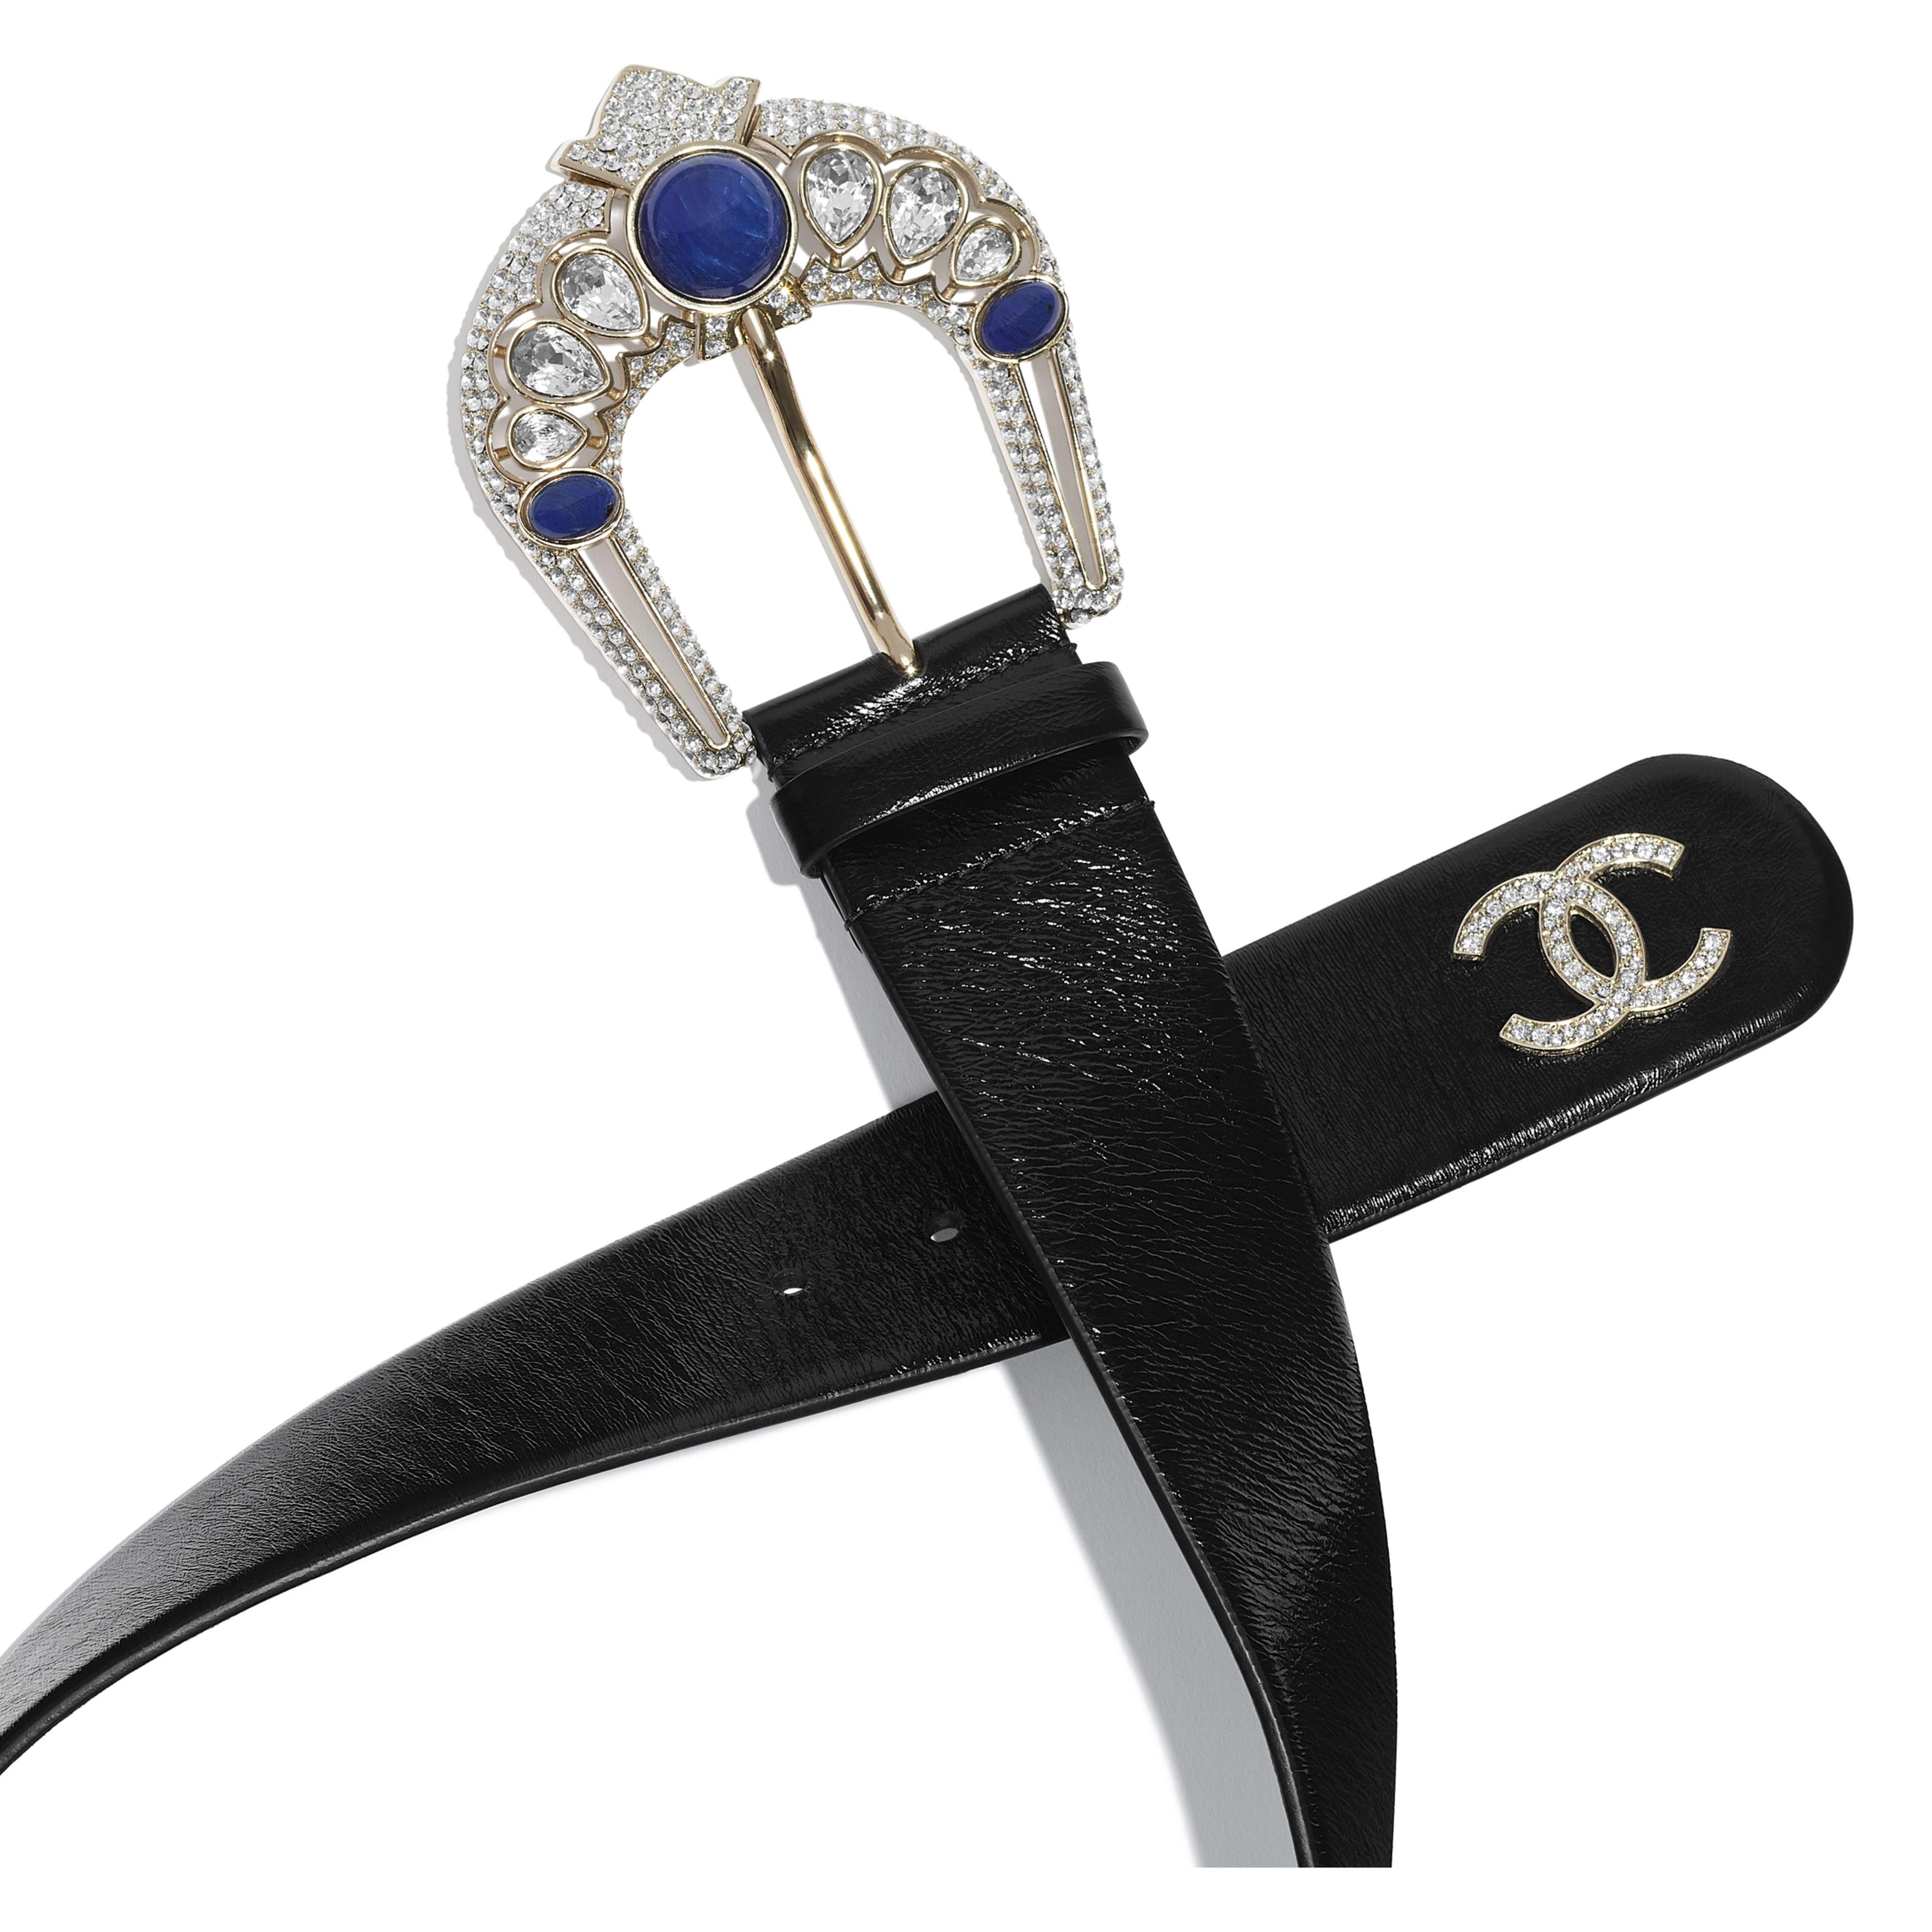 Belt - Black & Blue - Calfskin, Gold-Tone Metal, Strass & Resin - Alternative view - see full sized version